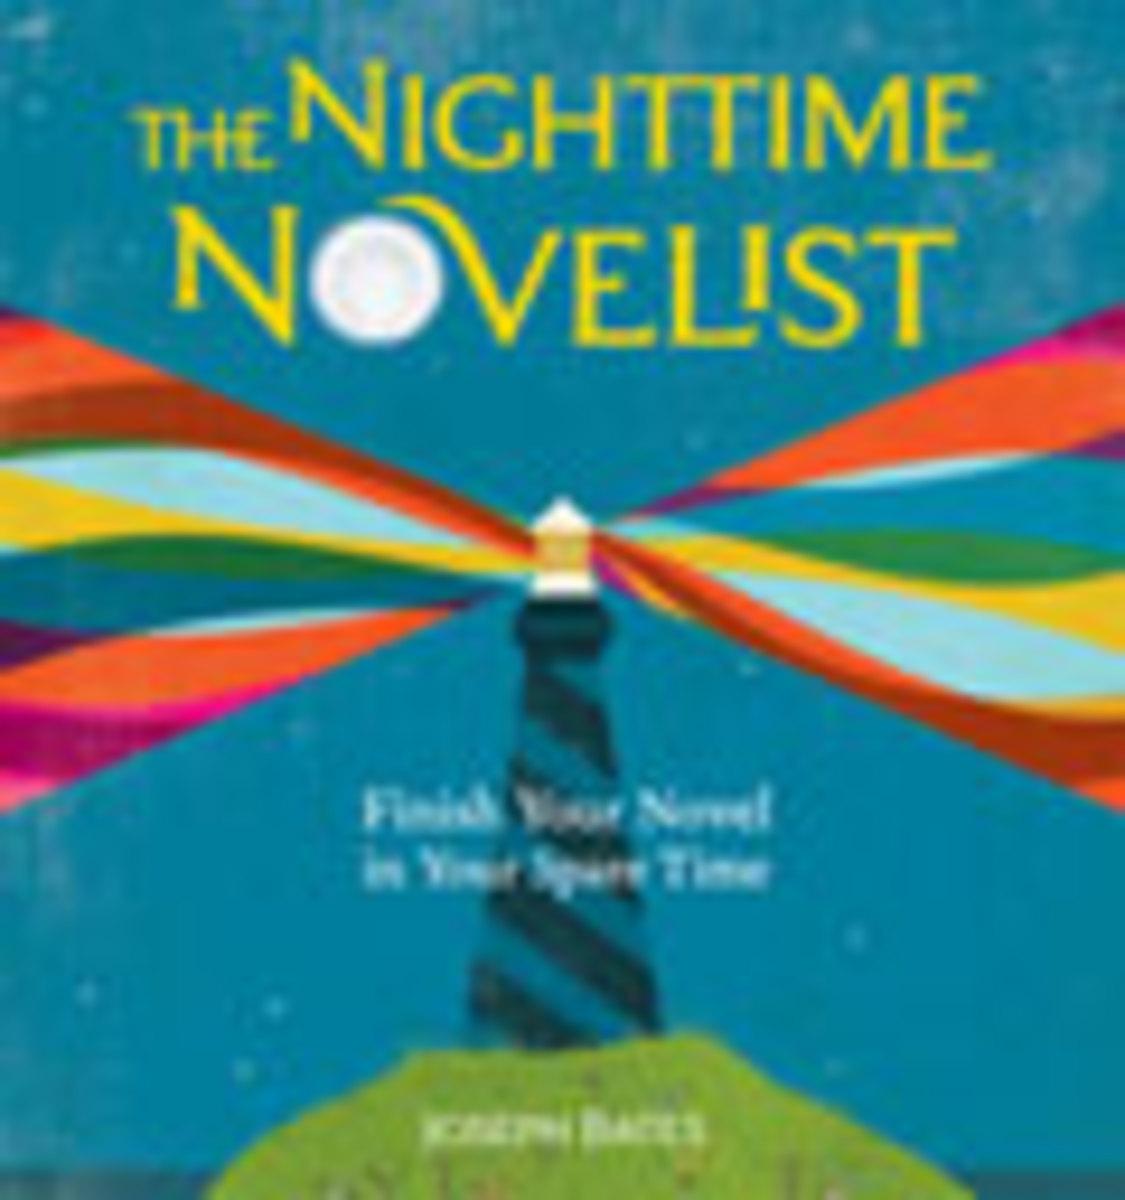 The Nighttime Novelist | ideas for a good story